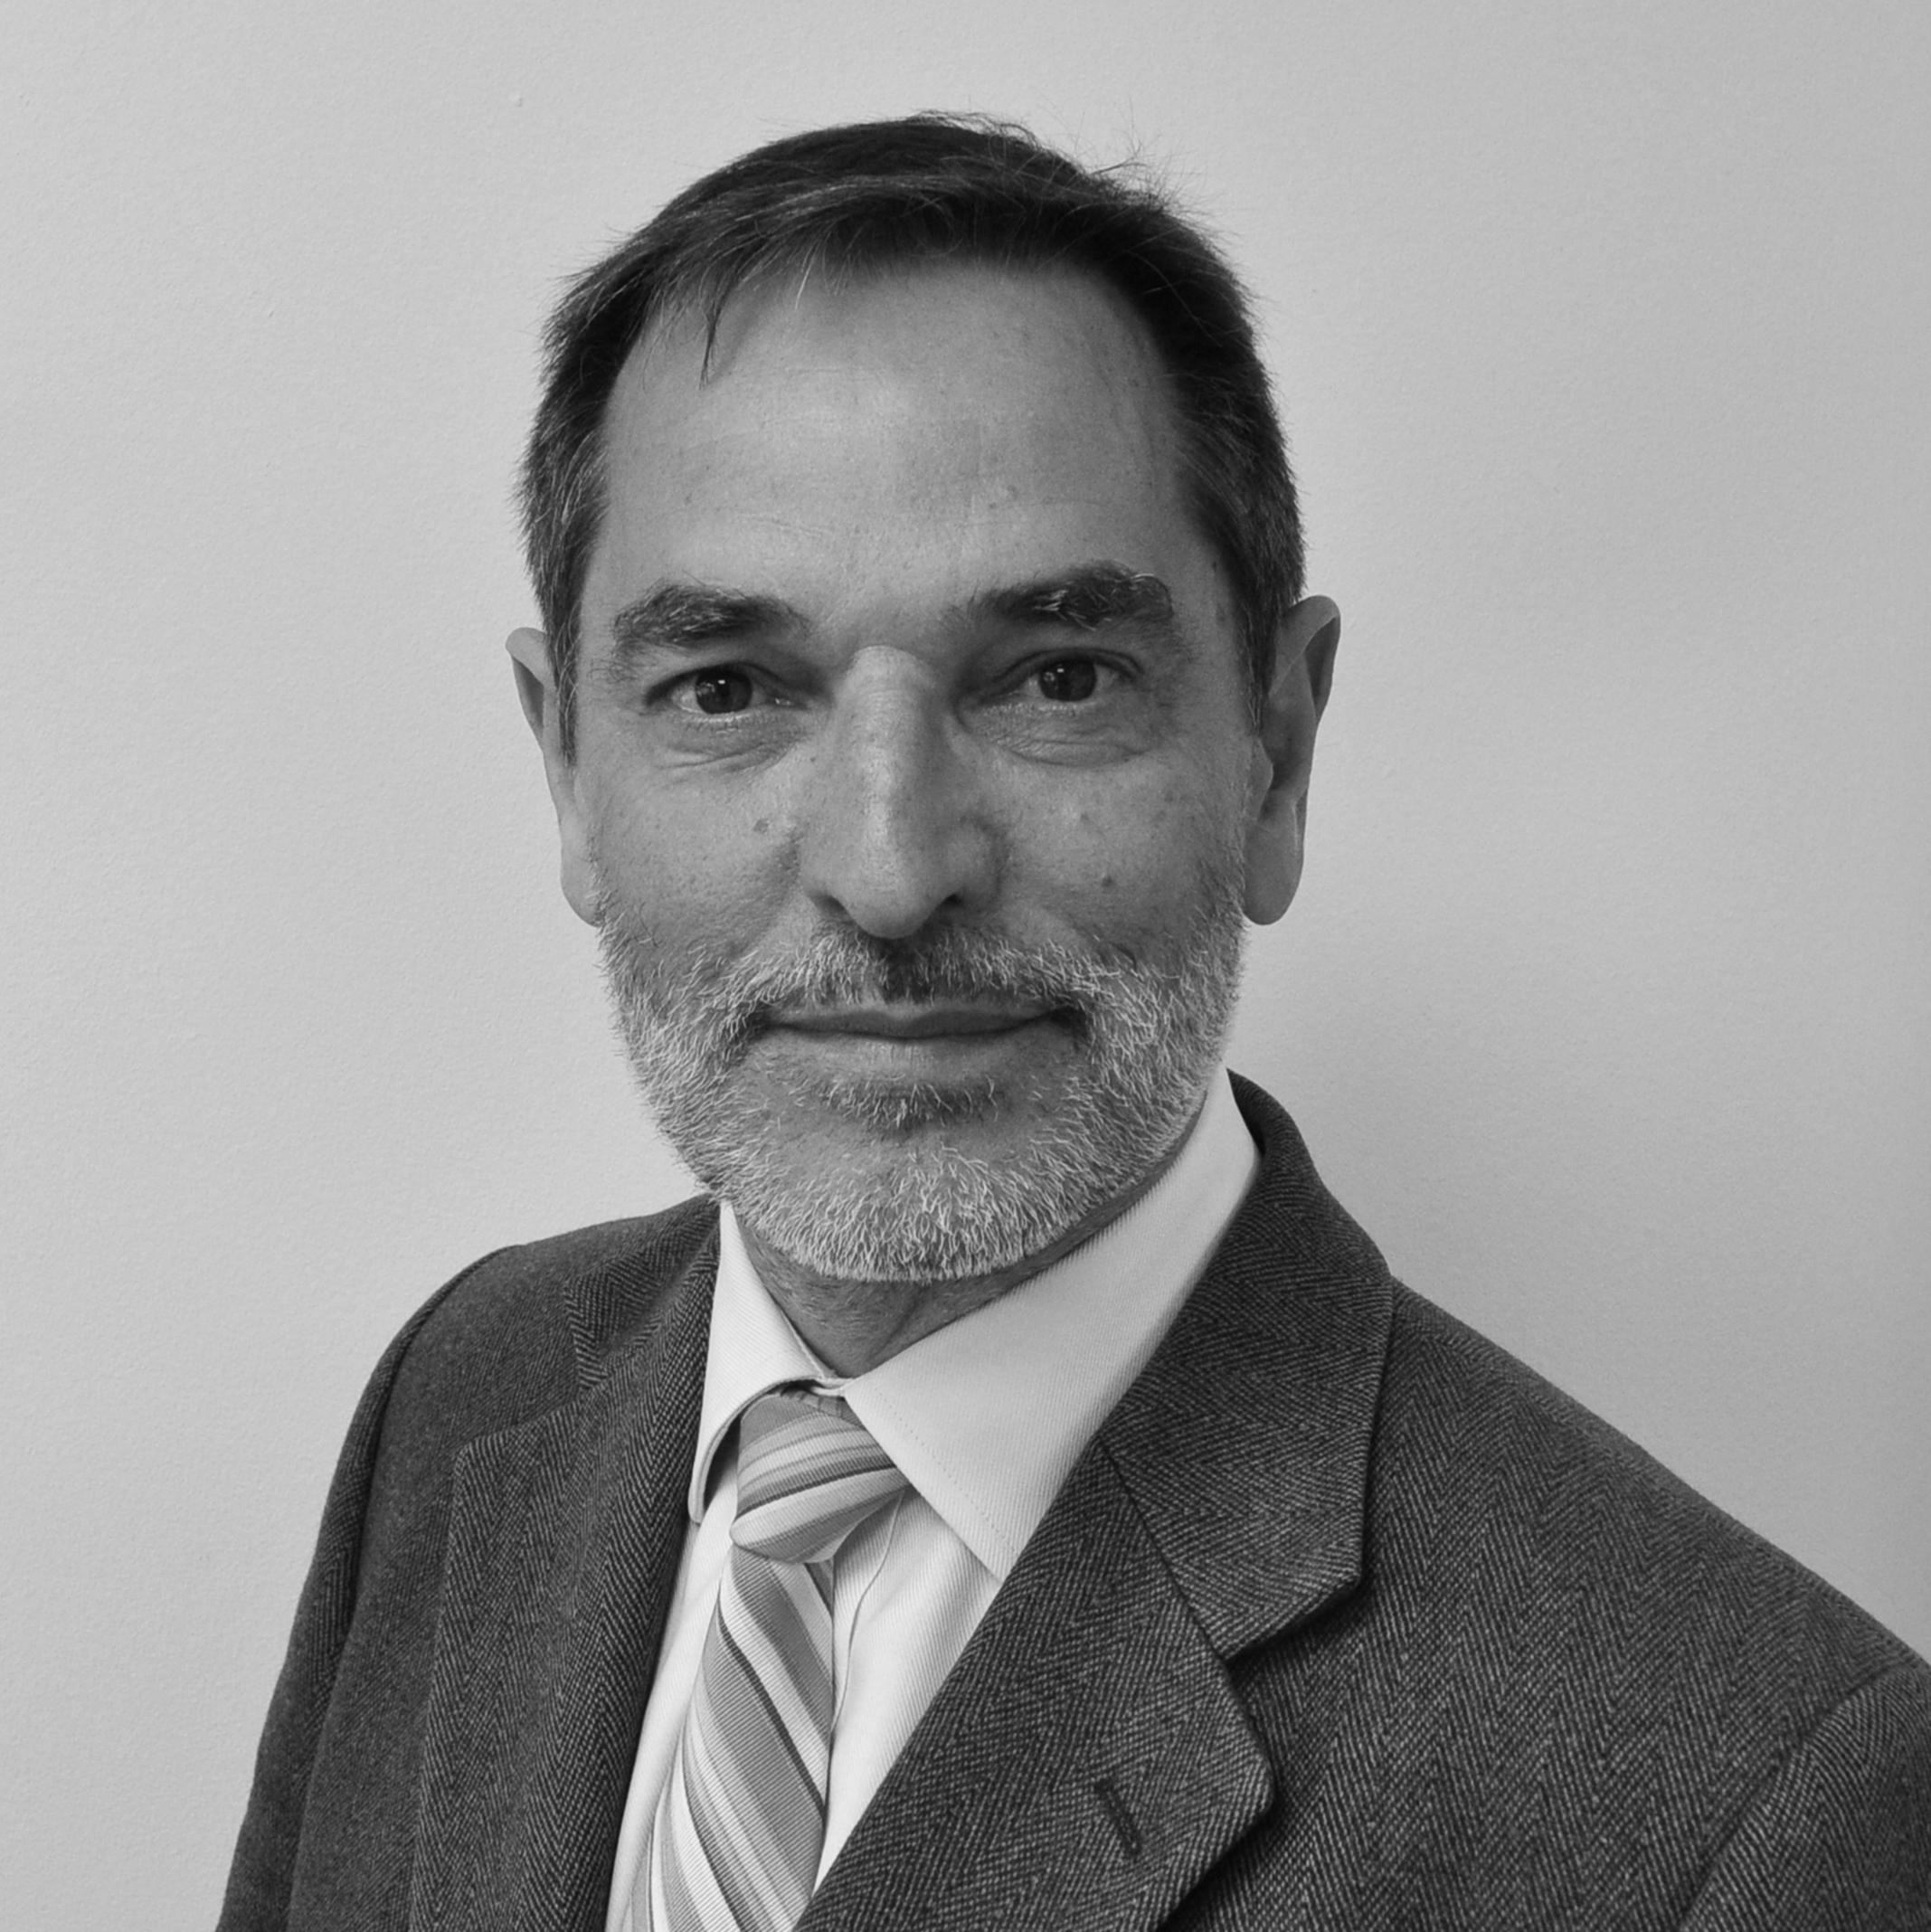 Kevin Stratford